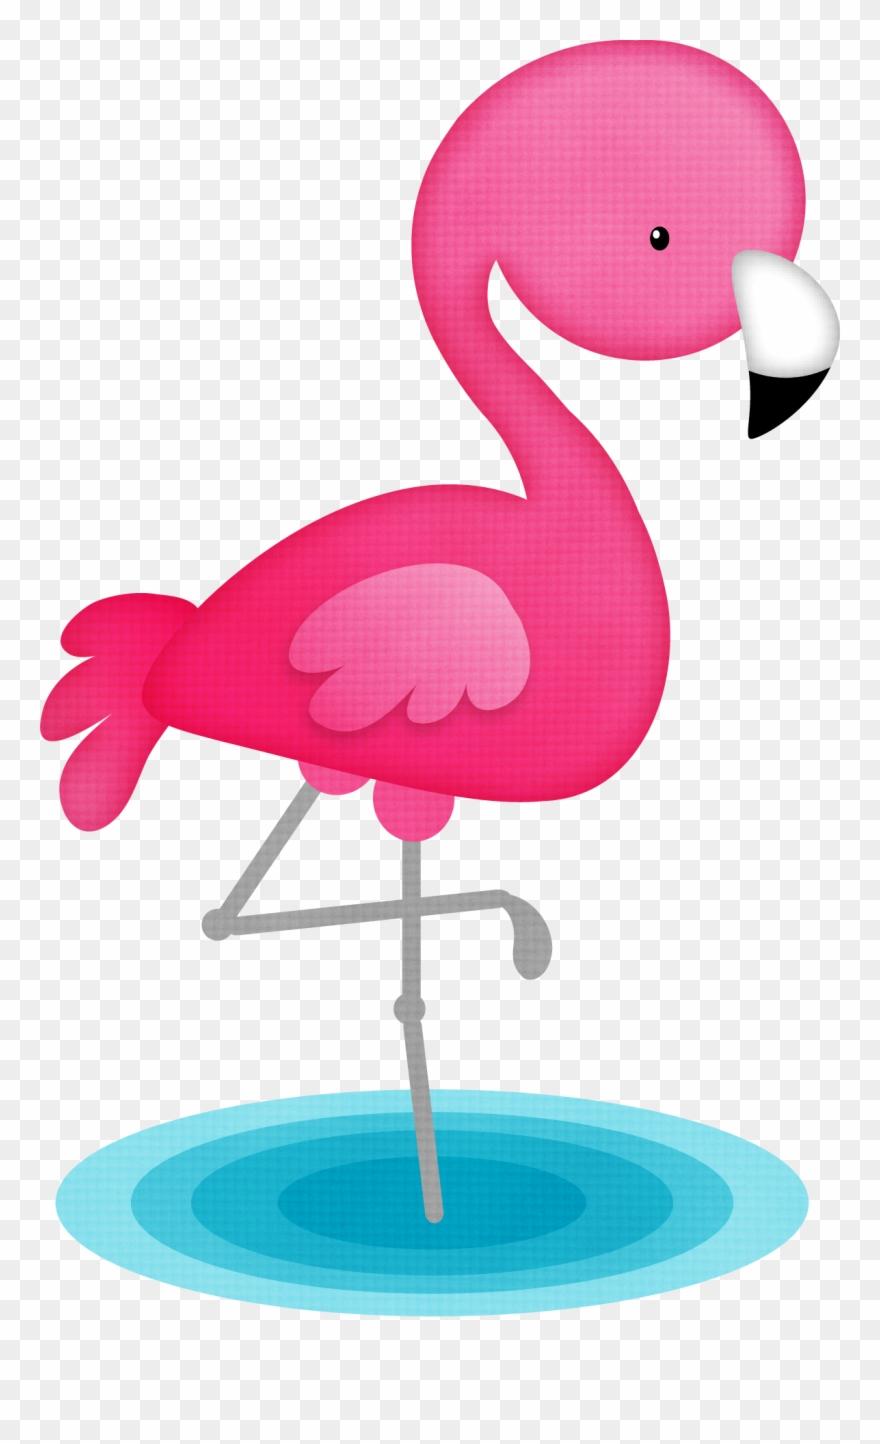 Cute flamingo clipart transparent stock Яндекс - Фотки - Flamingo Cute Clipart - Png Download (#119804 ... transparent stock